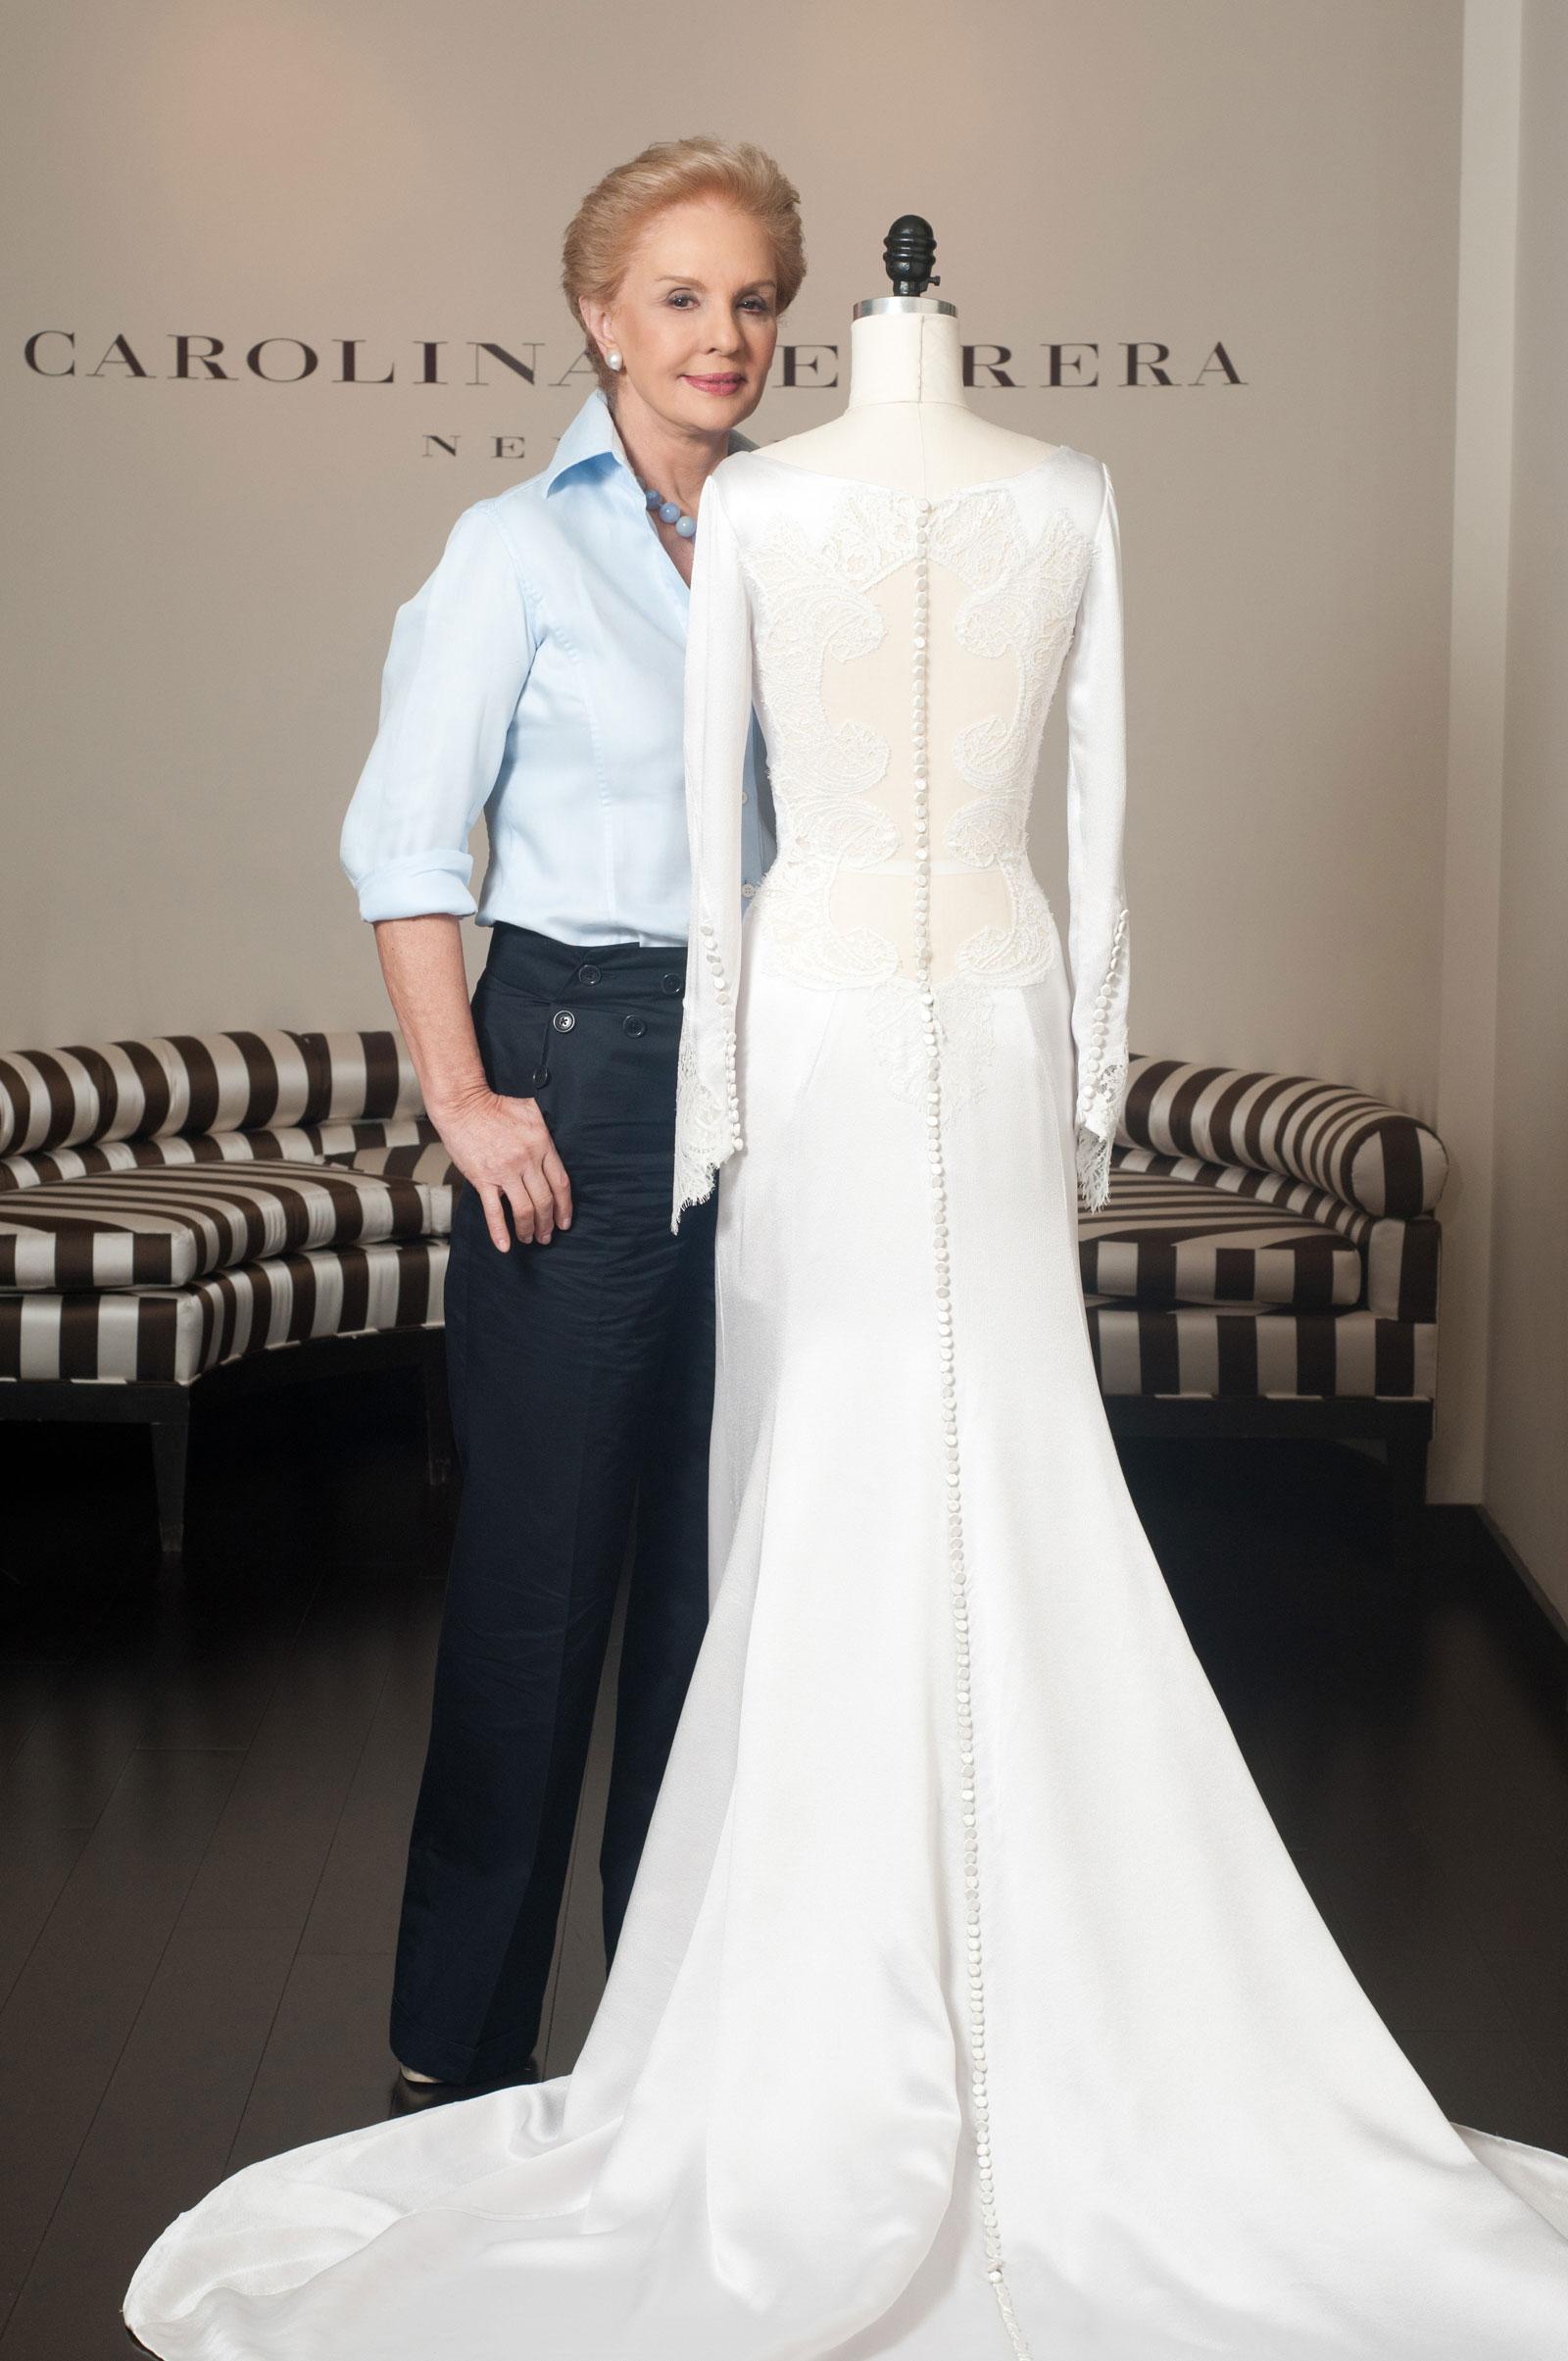 carolina-herrera-with-bella-swan-s-twilight-wedding-dress.jpg